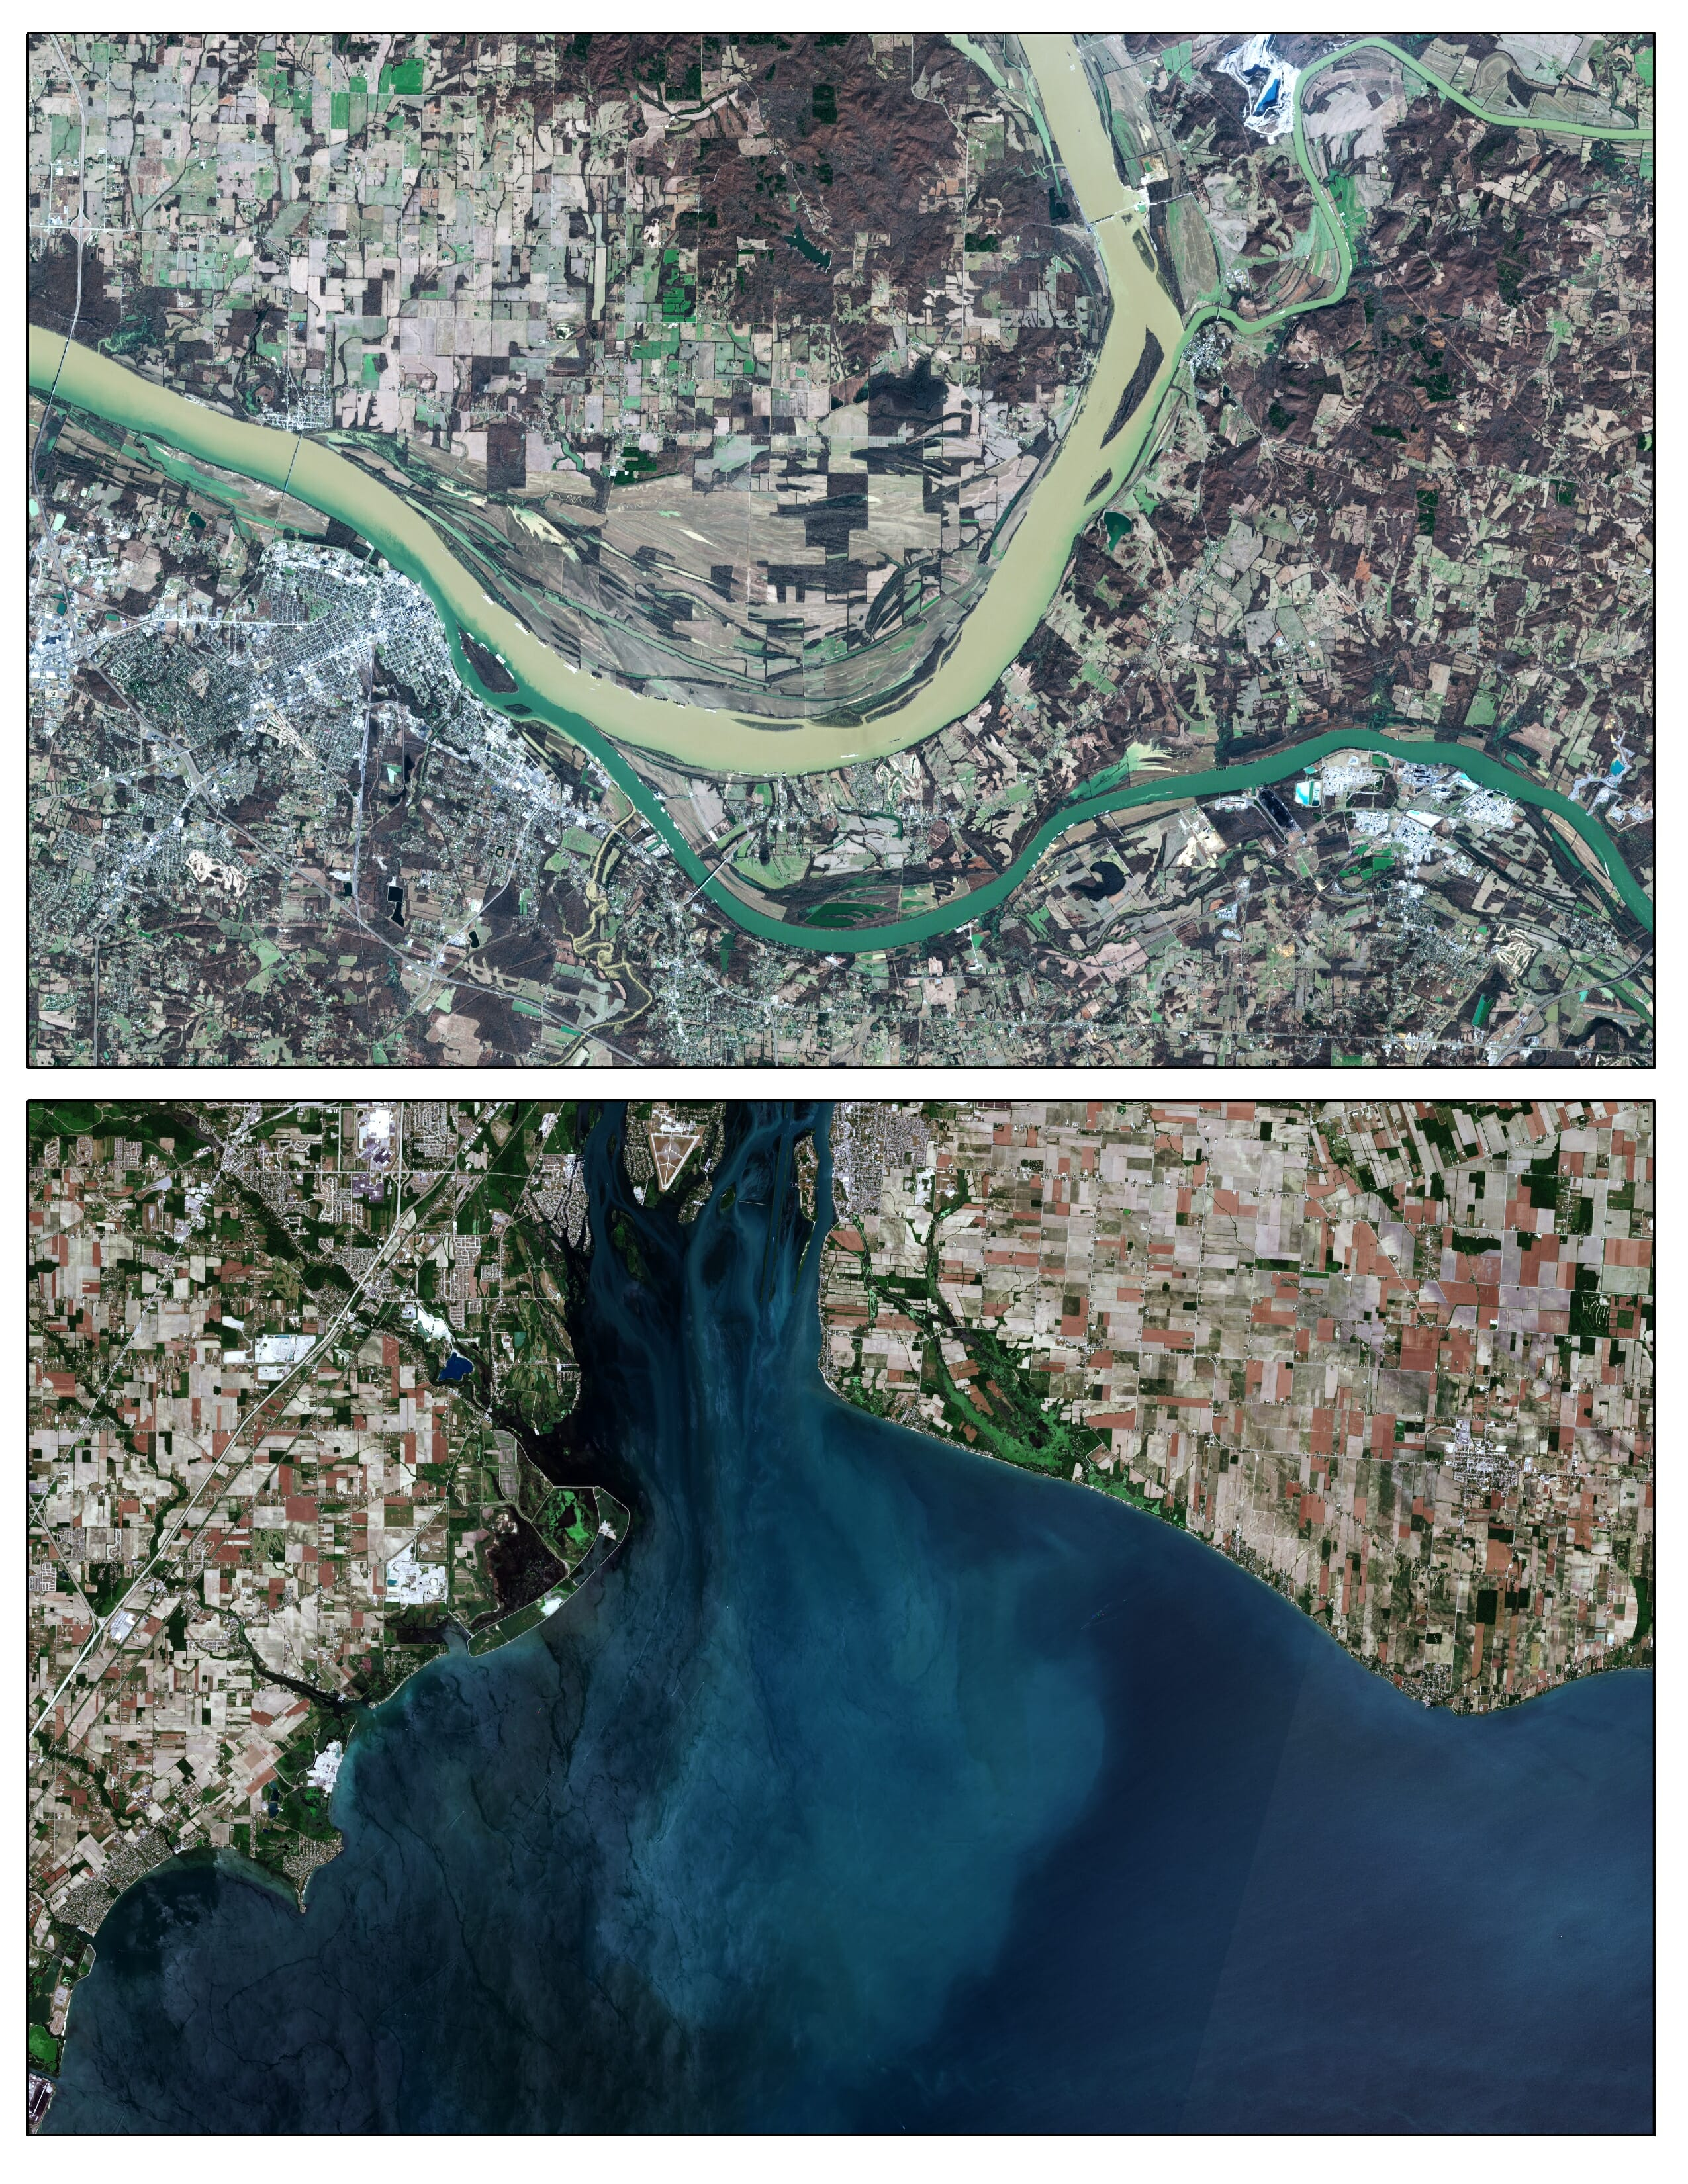 Source: Sentinel 2 satellite, European Space Agency